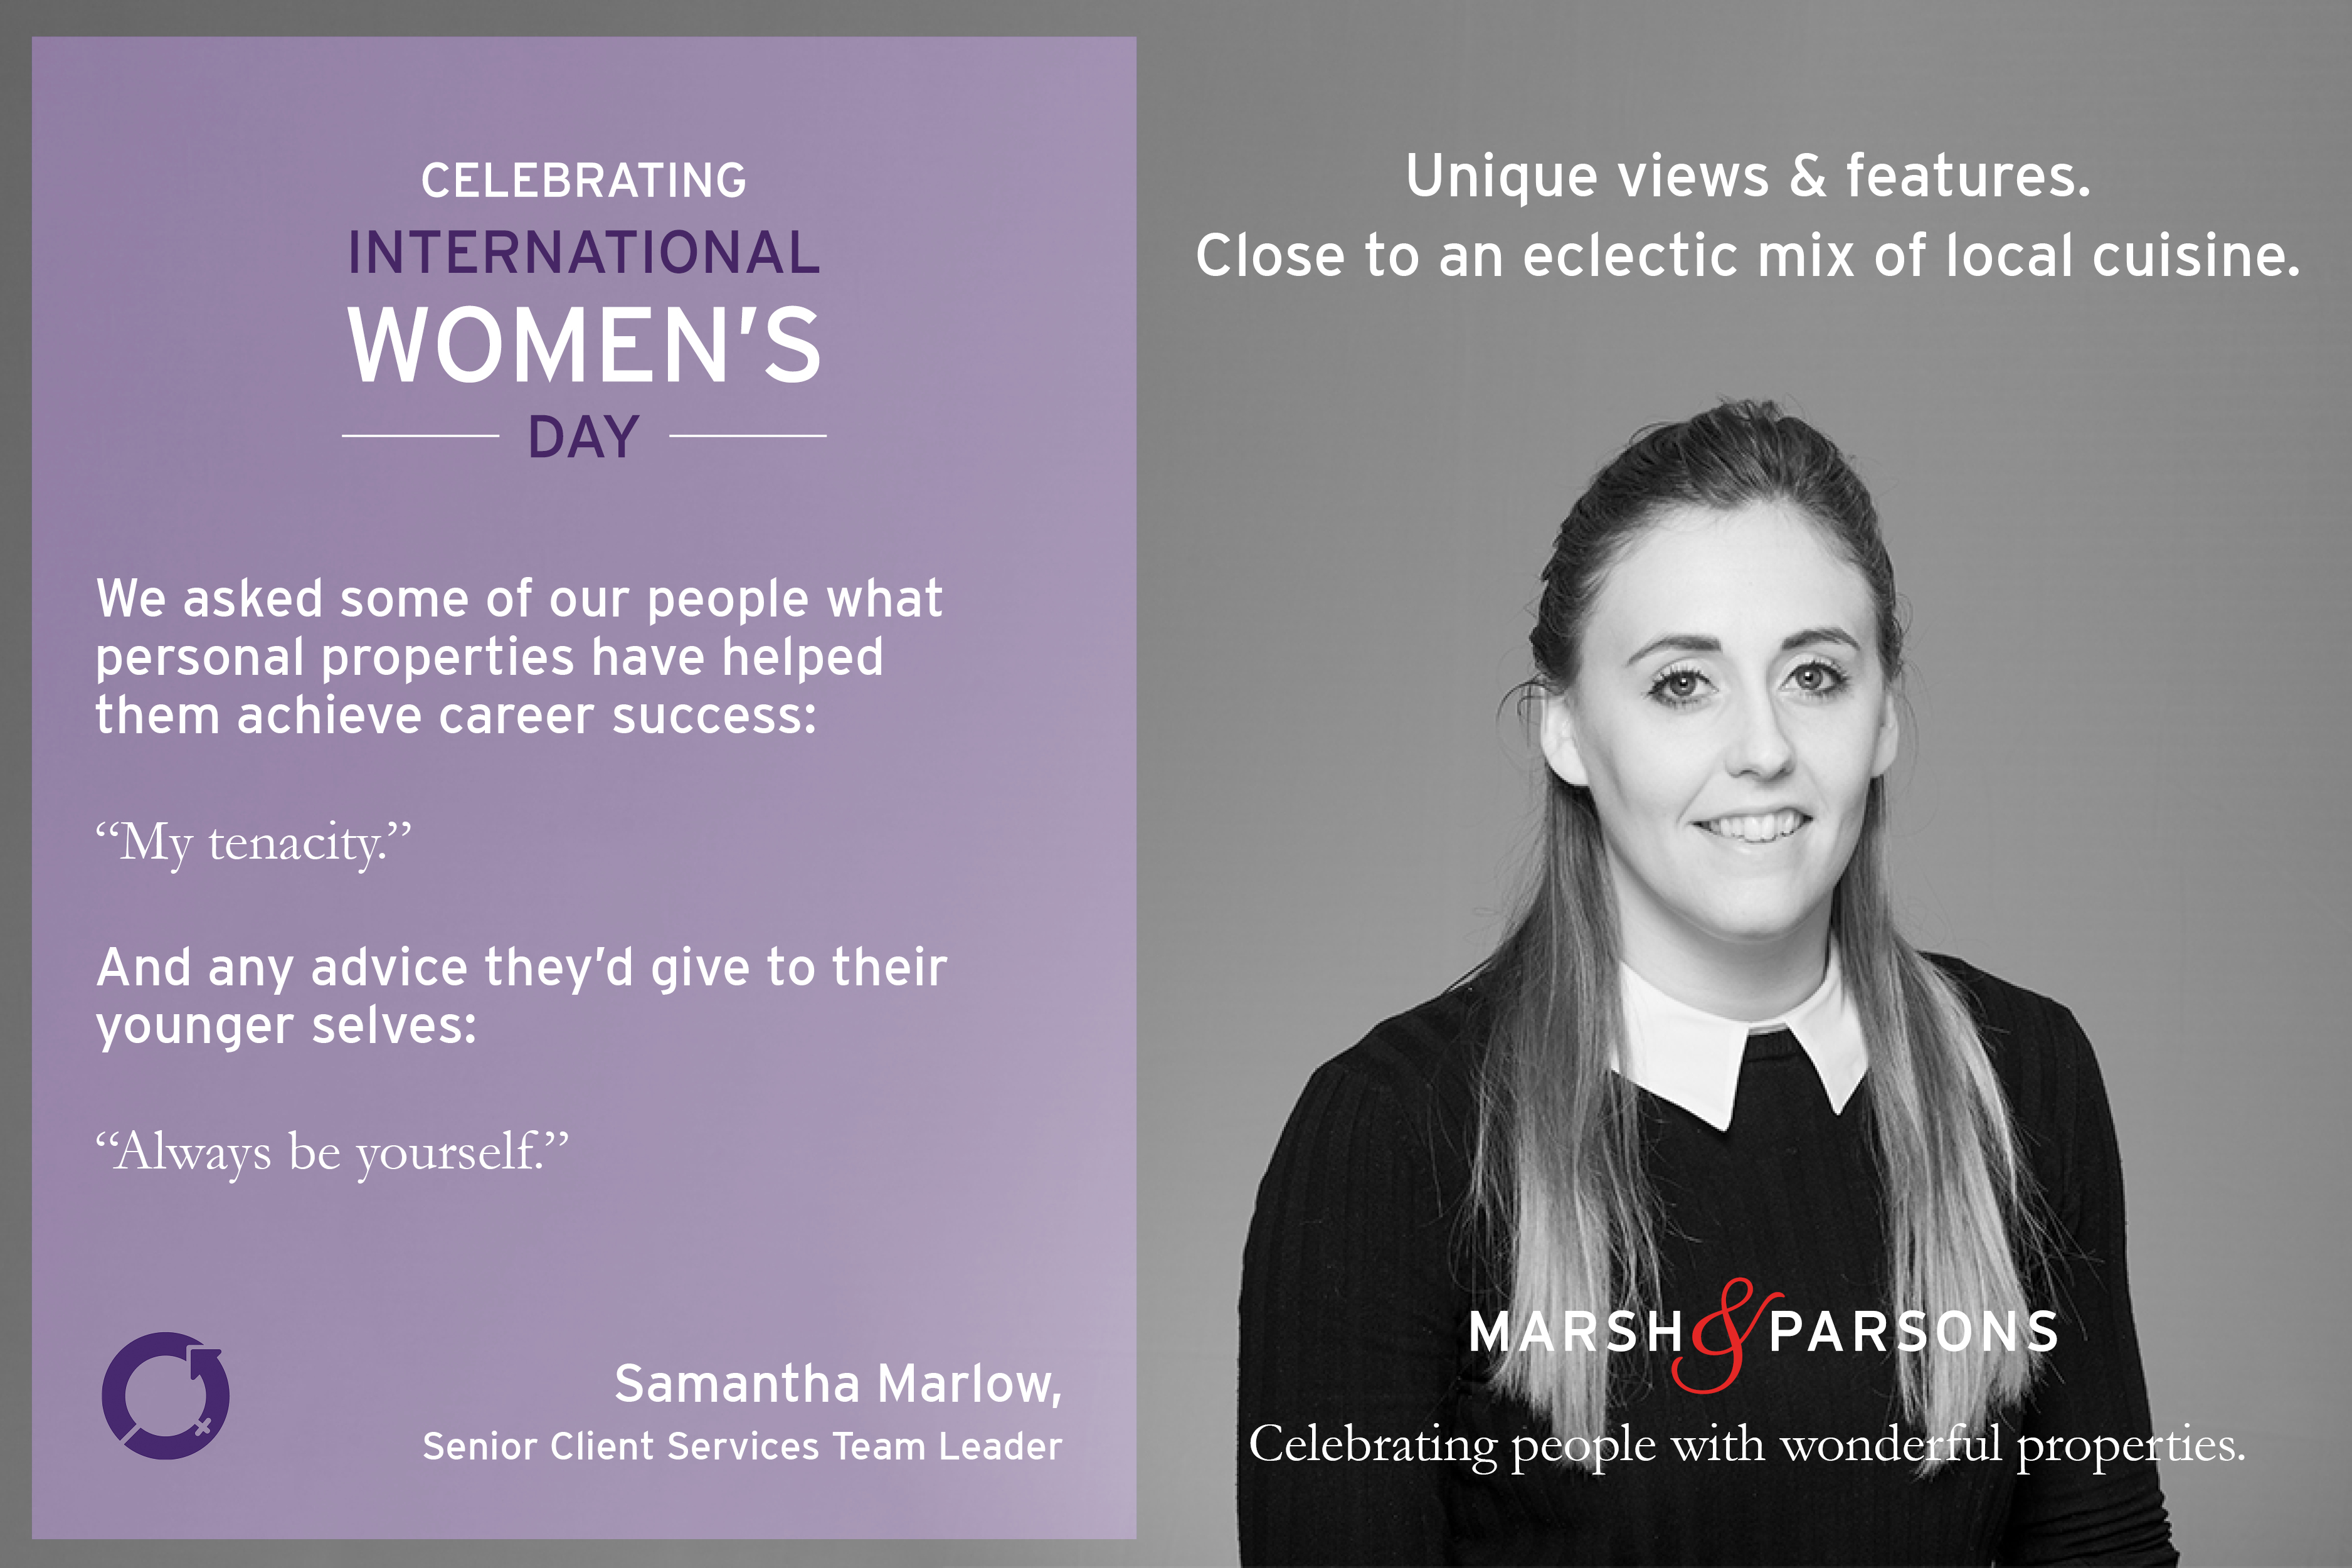 Samantha Marlow, International Women's Day